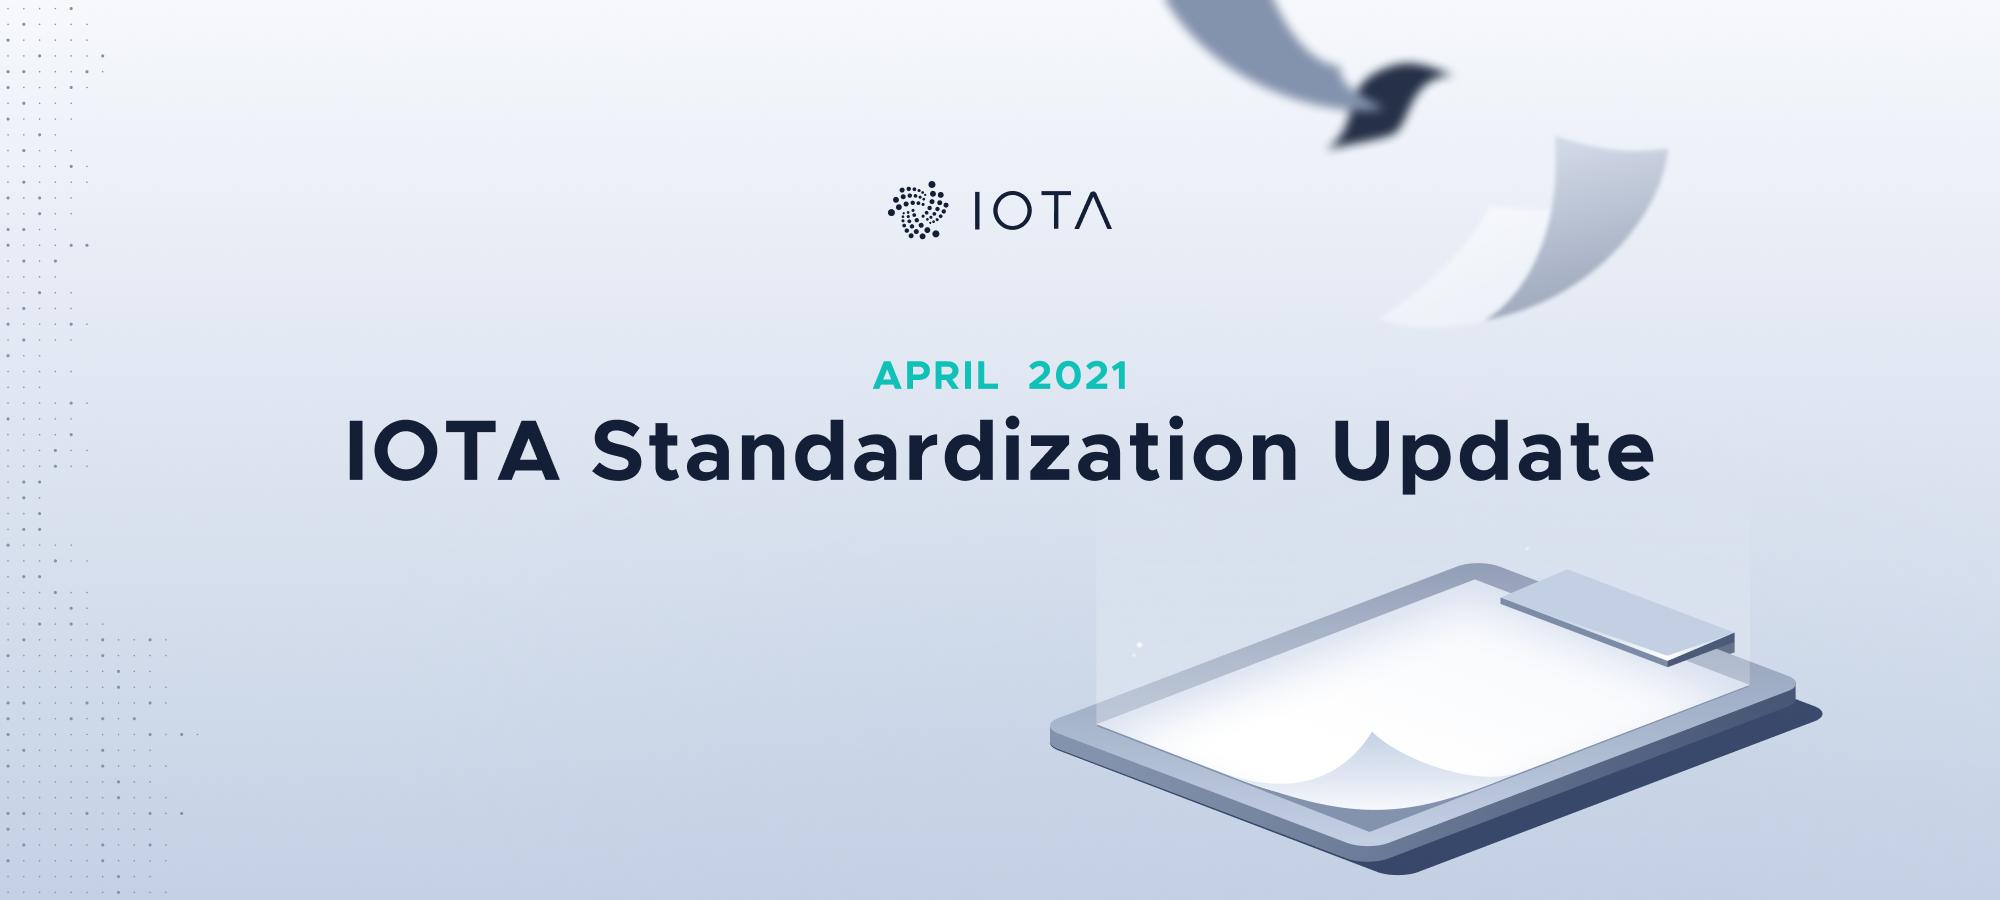 IOTA Standardization Update April 2021